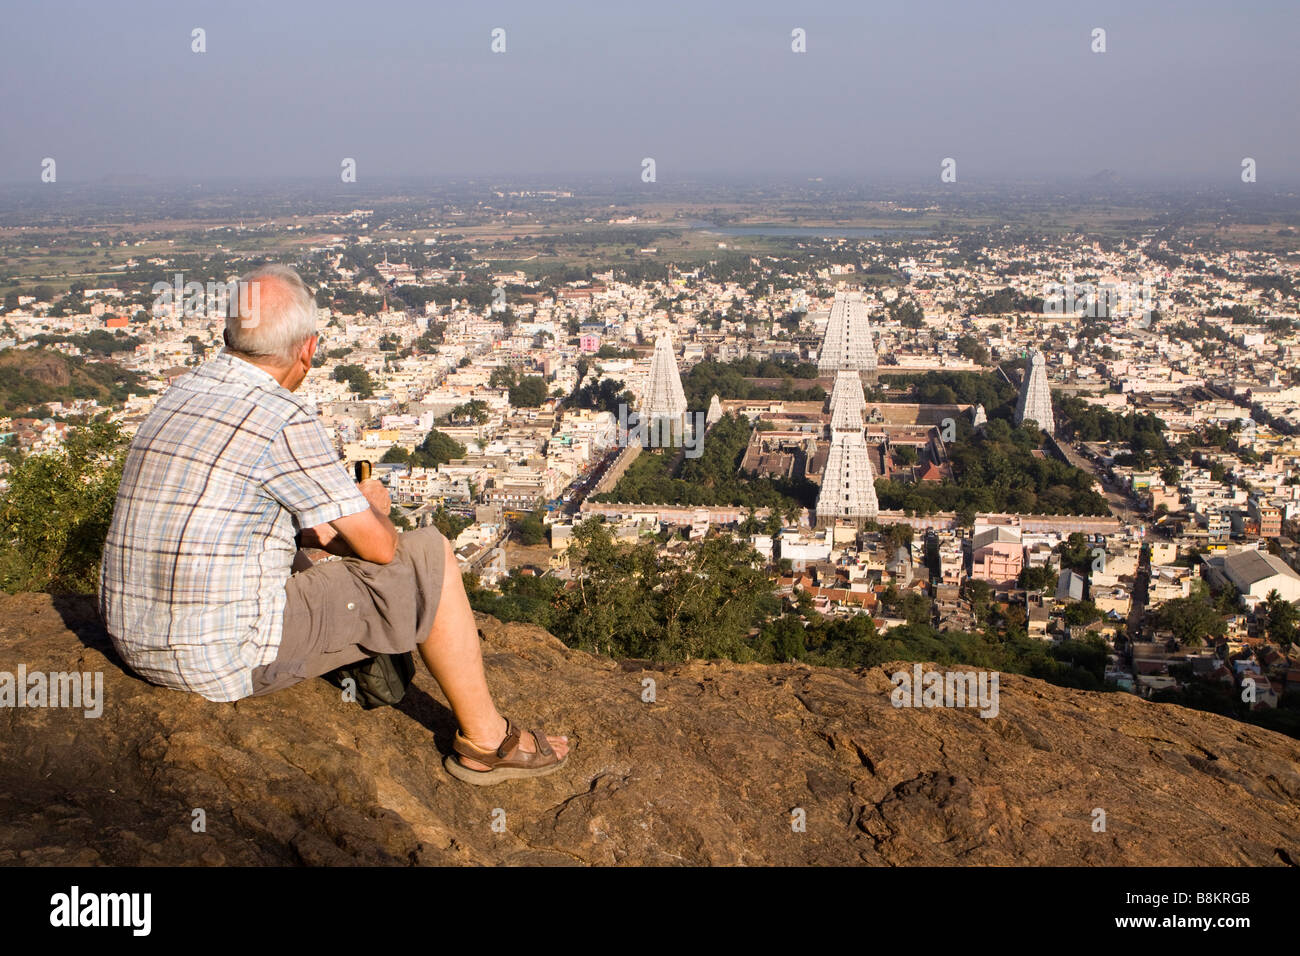 India Tamil Nadu Tiruvannamalai western visitor admiring hillside view above Arunachaleswar temple - Stock Image